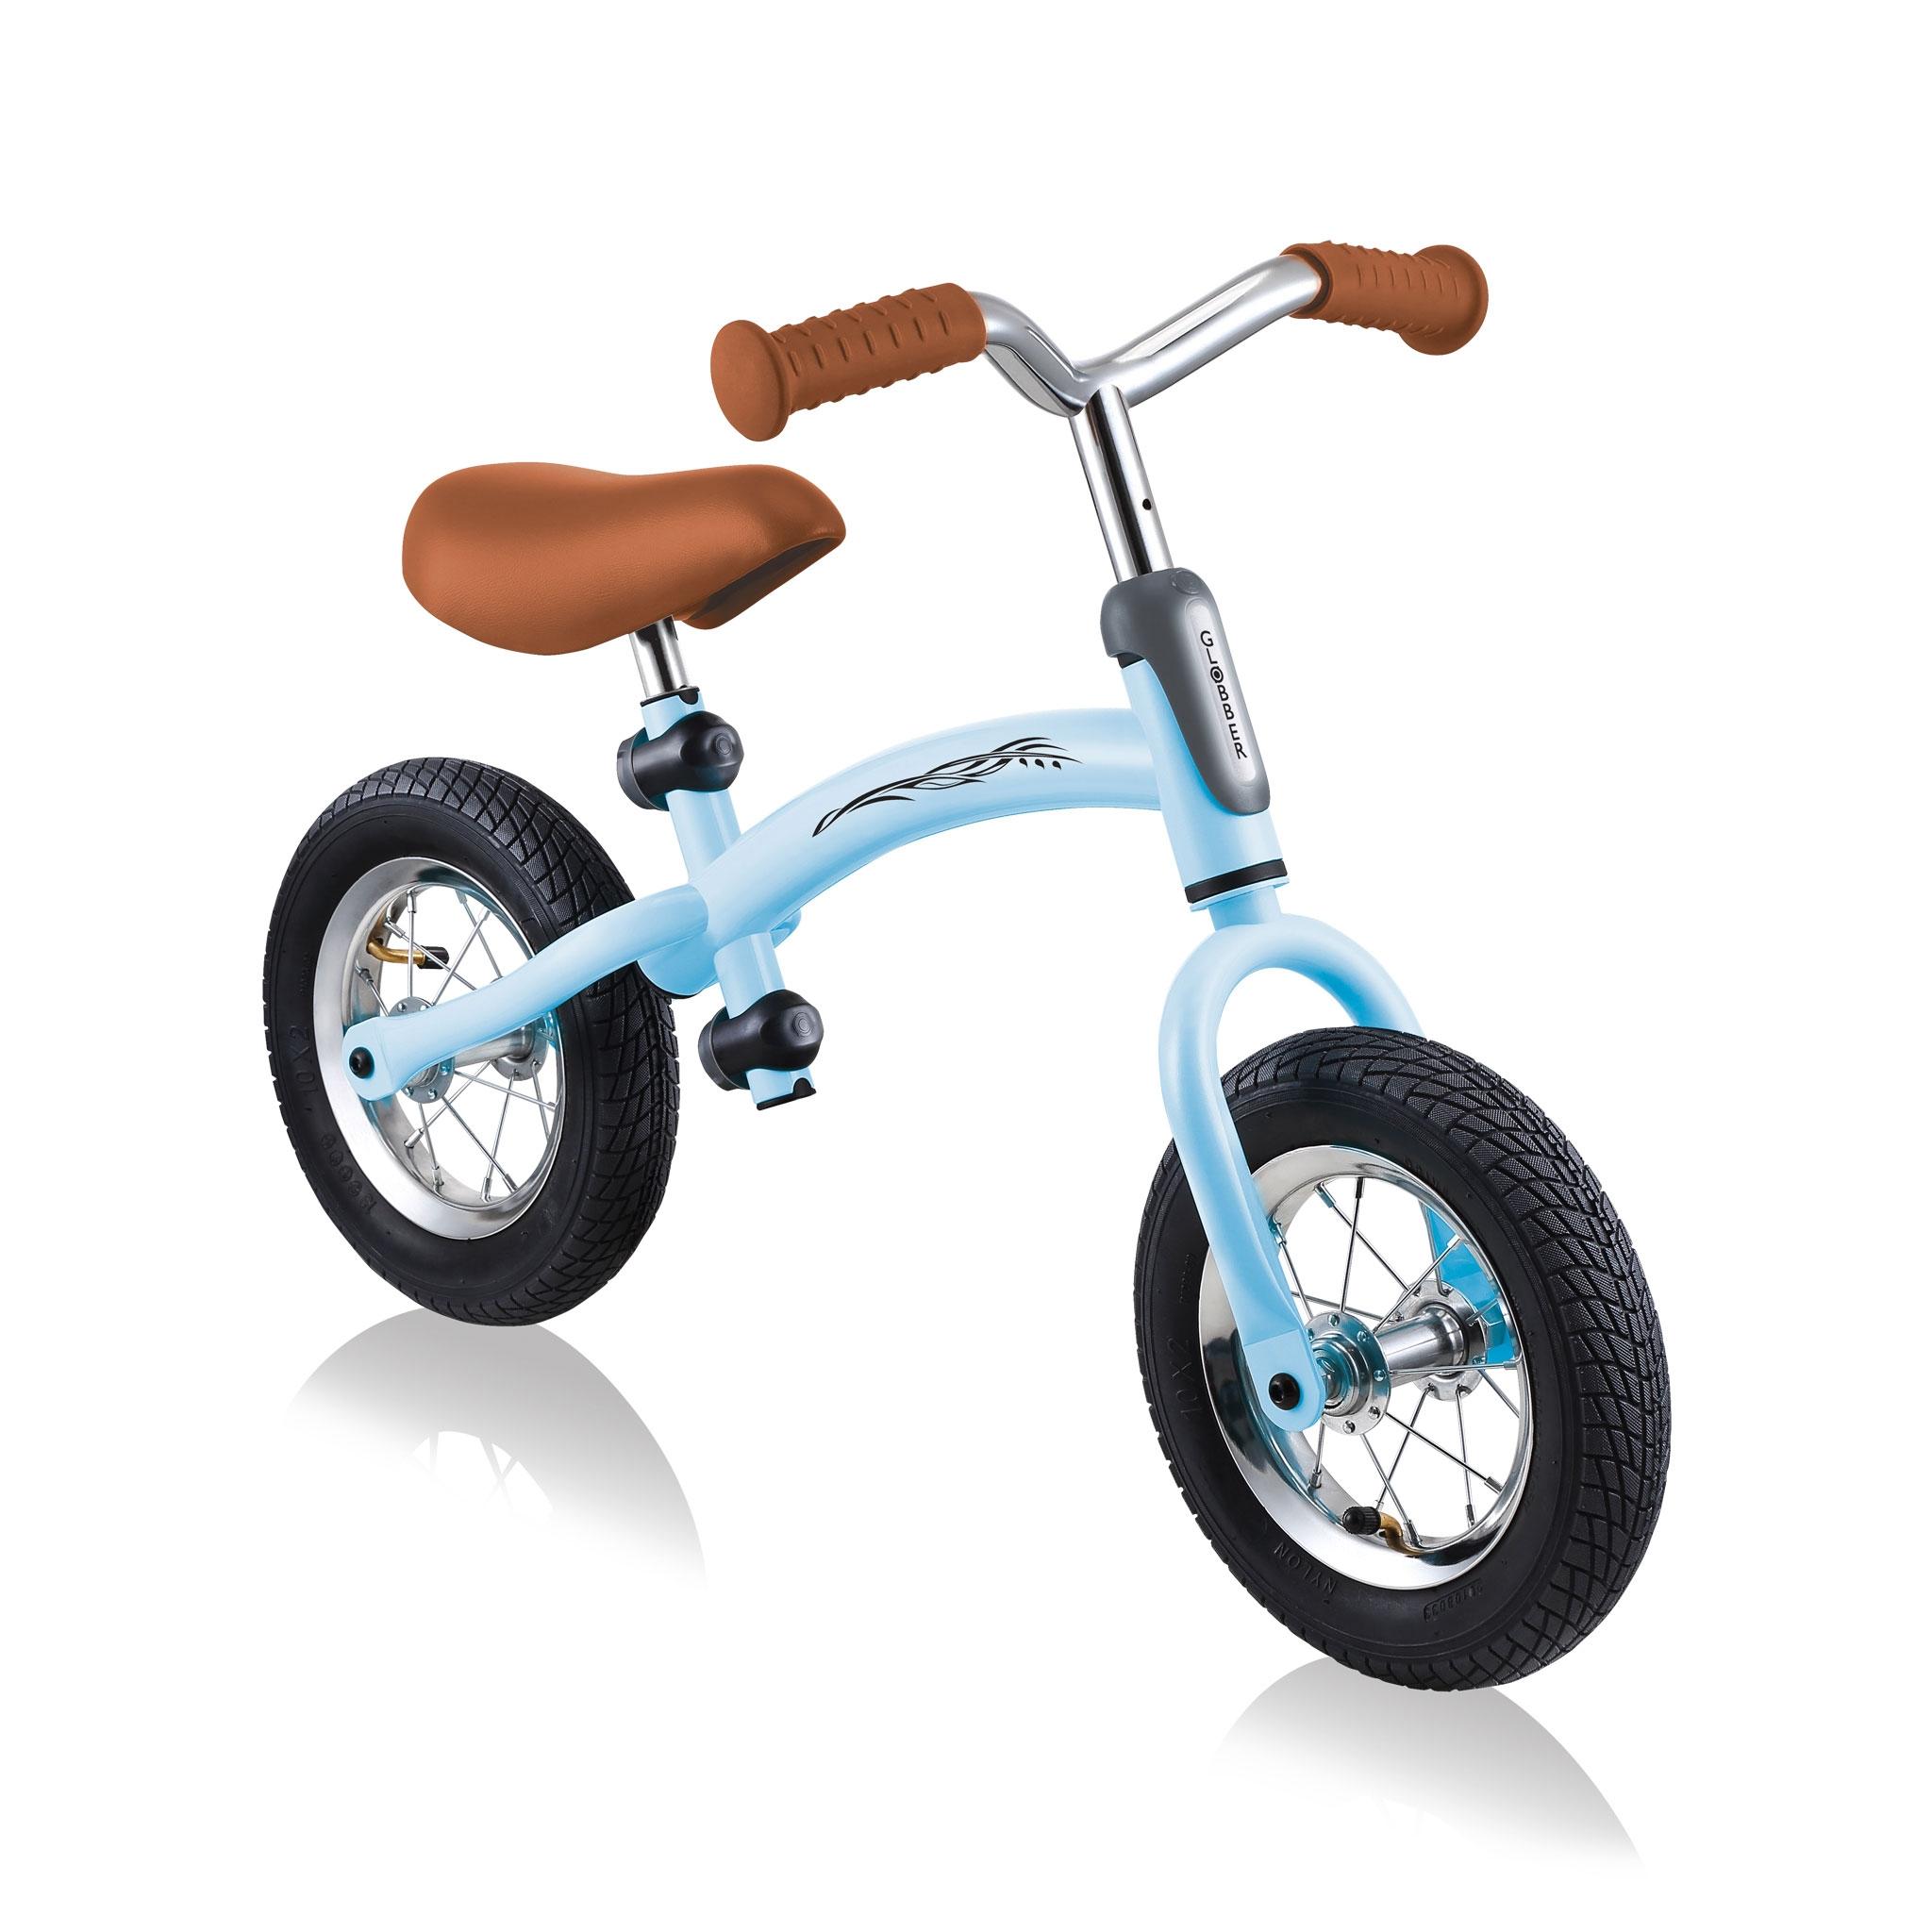 GO-BIKE-AIR-best-toddler-balance-bike-for-kids-aged-3-to-6_pastel-blue